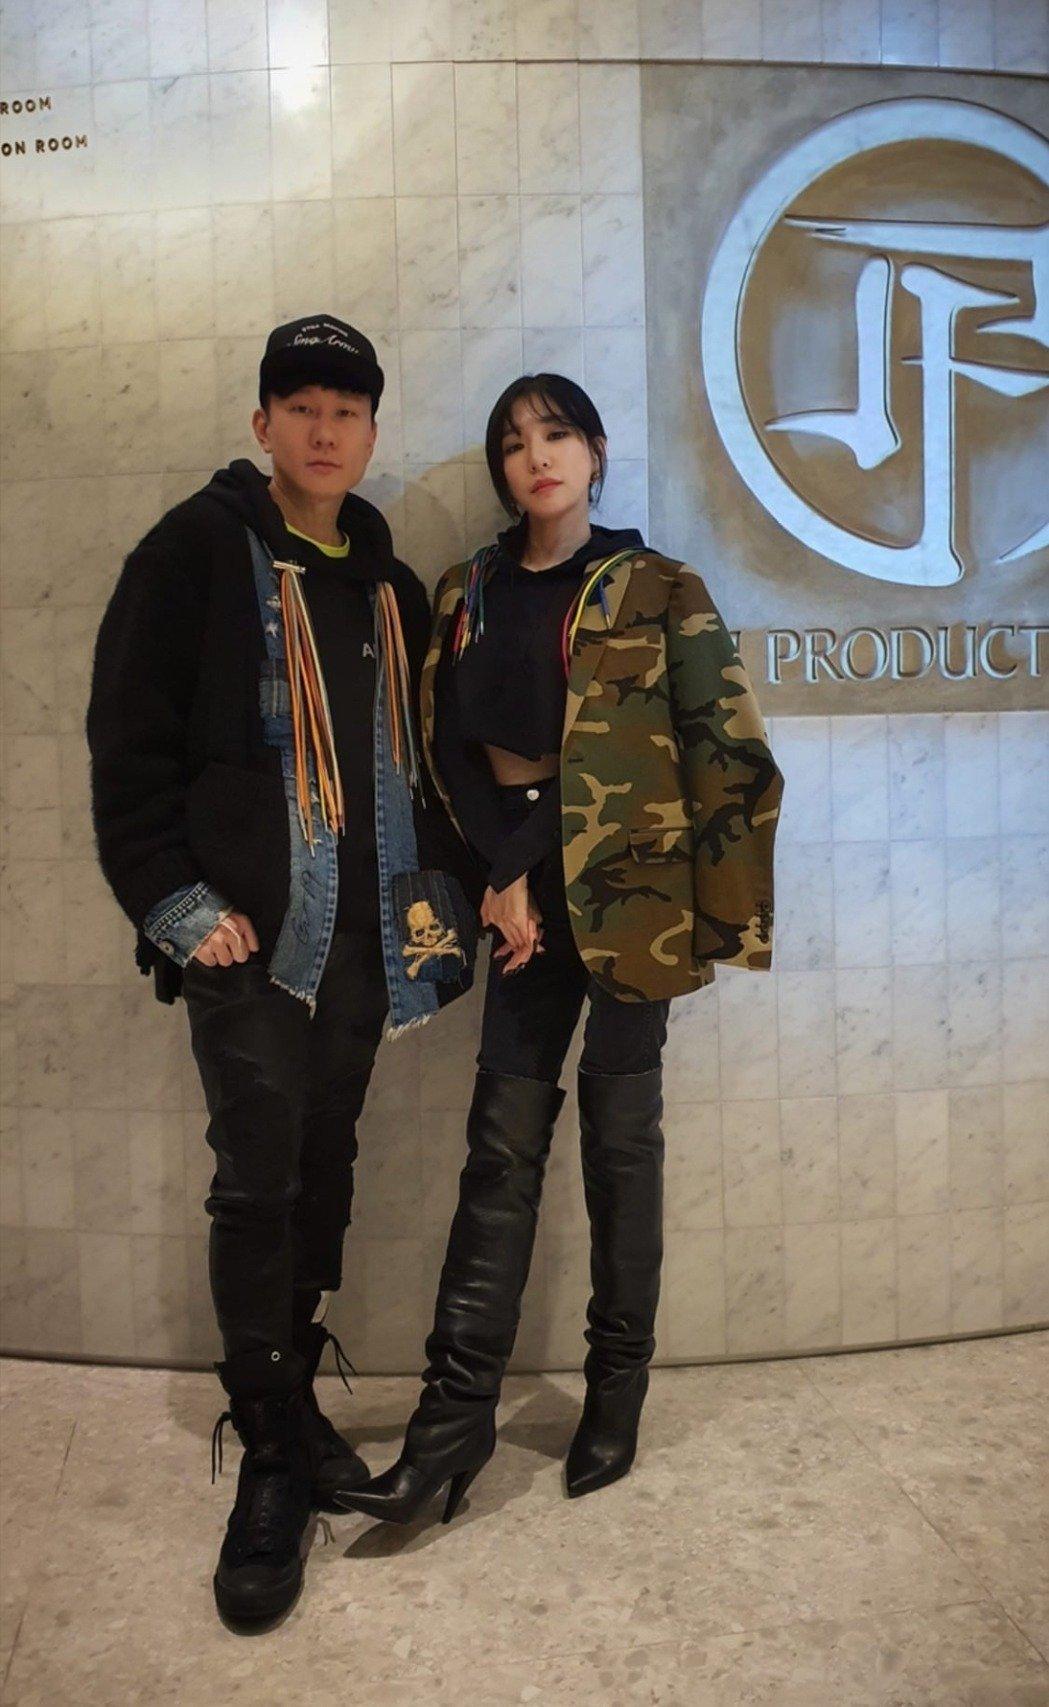 JJ林俊傑與Tiffany交情甚篤,歌迷敲碗期待2人有音樂合作。(翻攝IG)